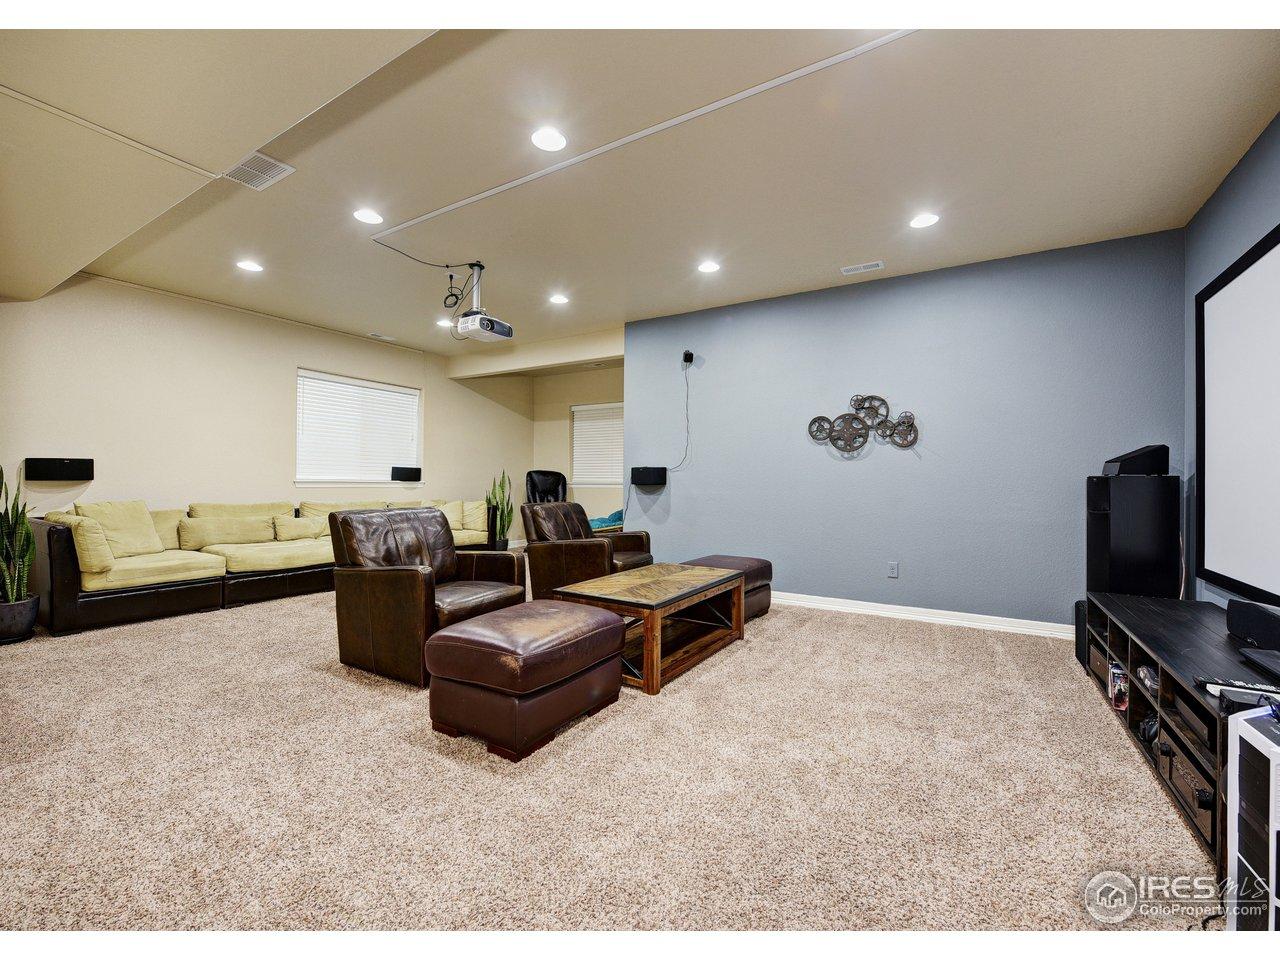 Theatre area/recreation room